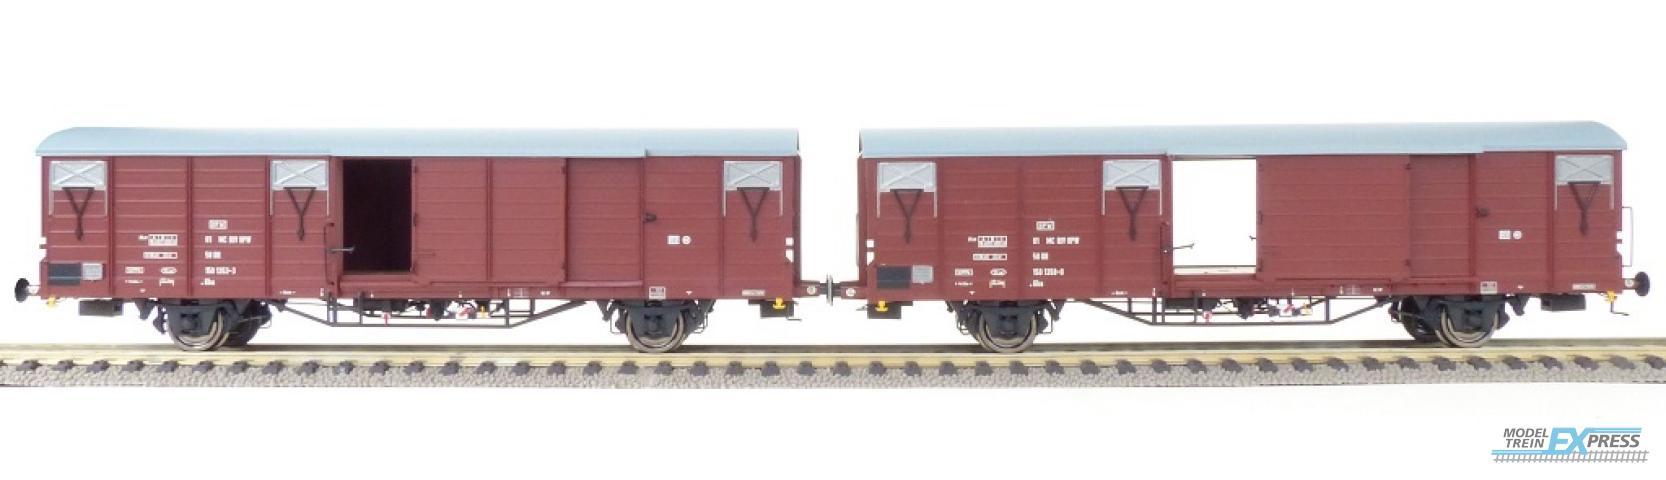 Exact-train 20466